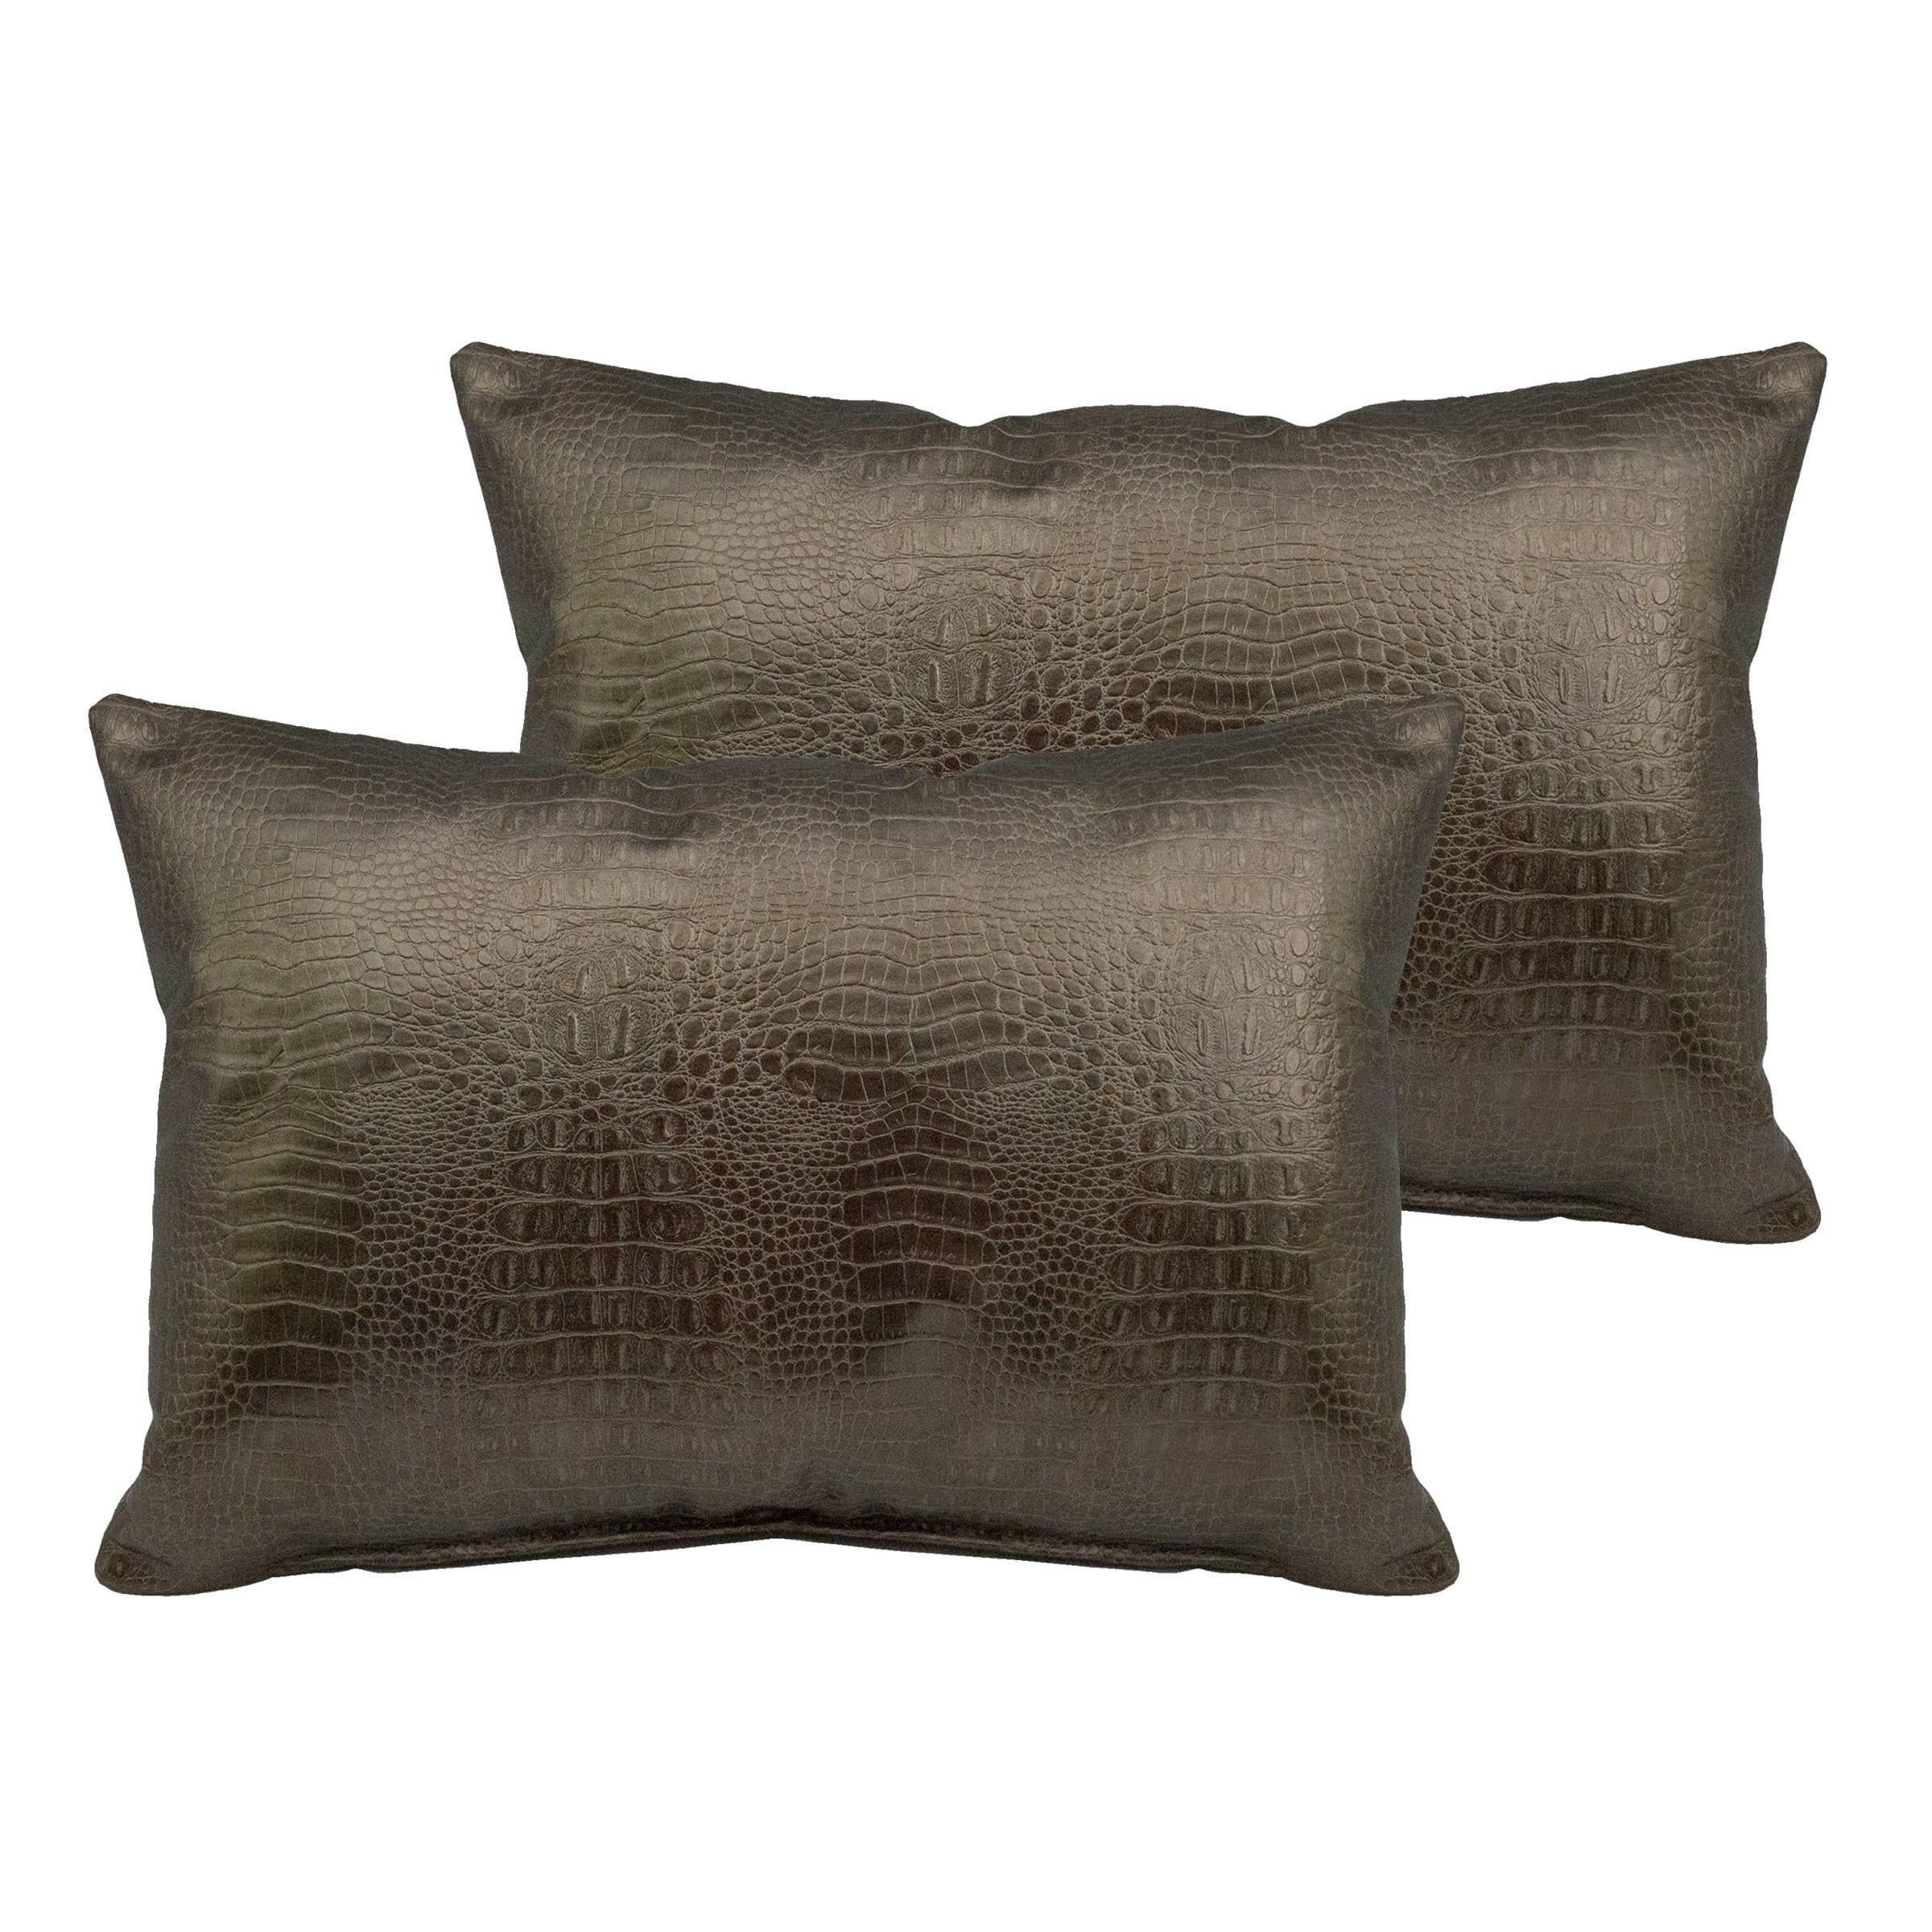 Sherry Kline  Gator Faux Leather Boudoir Pillow (Set of 2)